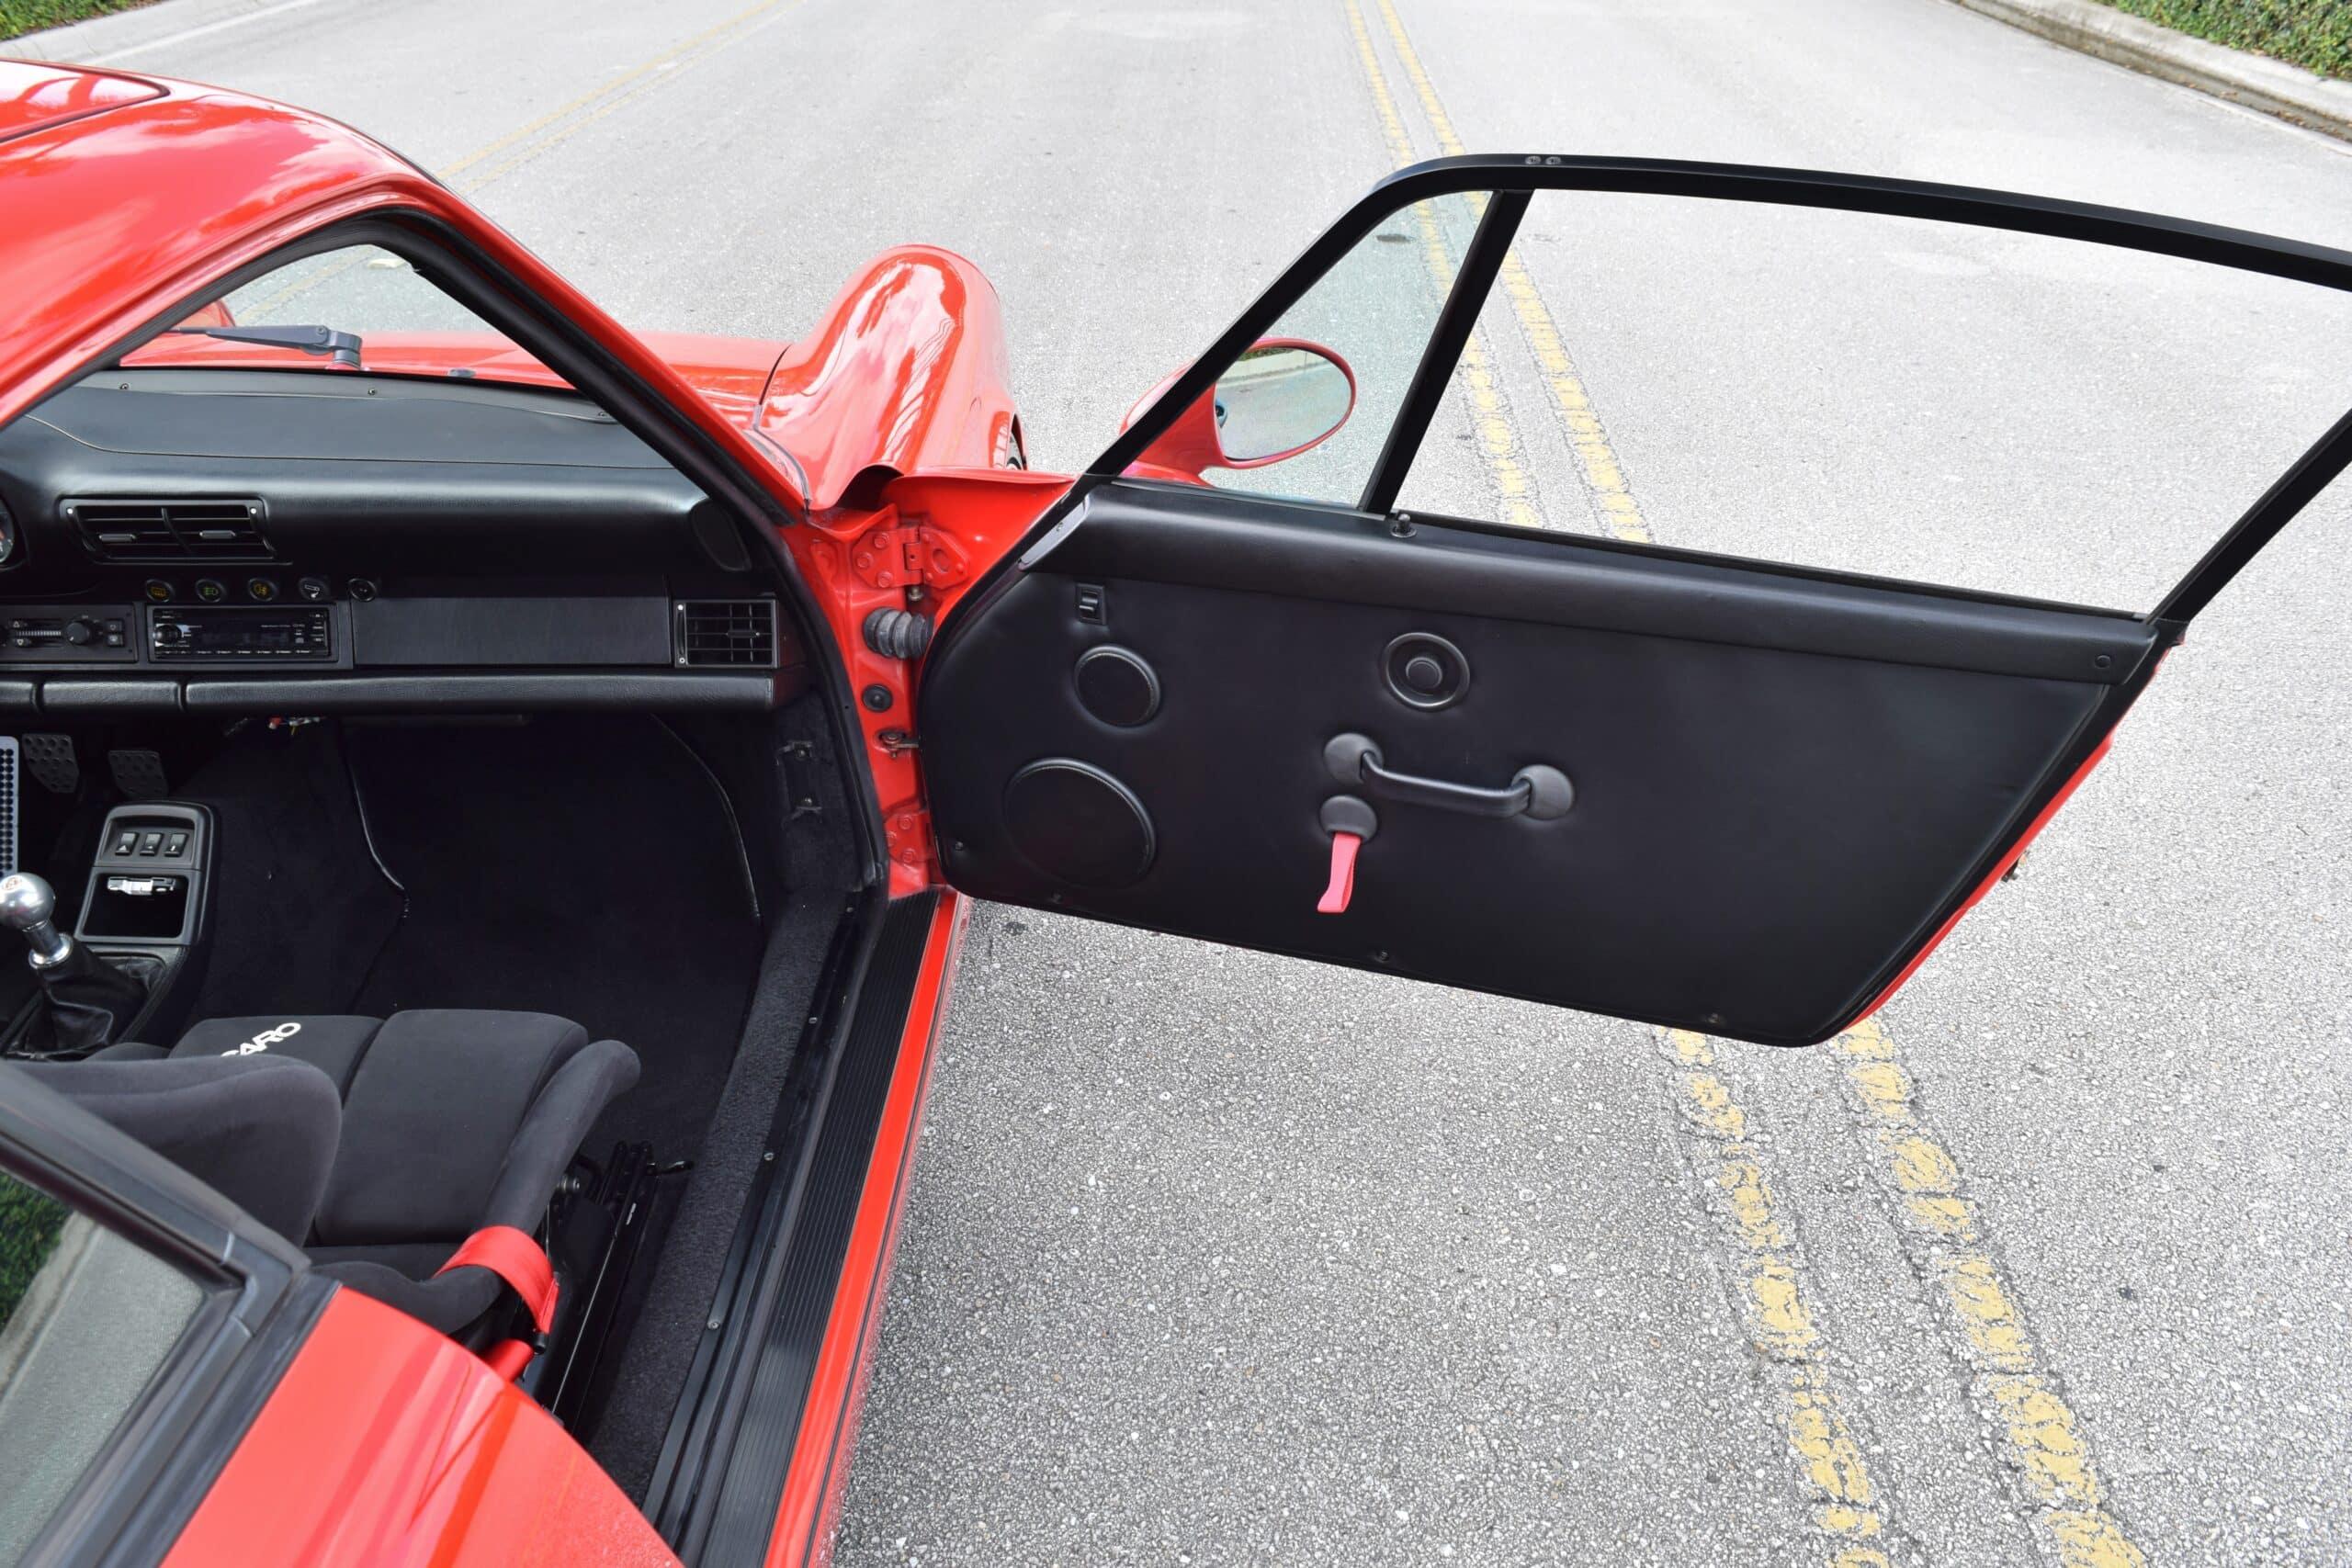 1990 Porsche 911 964 Carrera 2 Only 53k Miles-Ohlins Coilovers-BBS Wheels-Recaro Seats-Split Case Engine Build